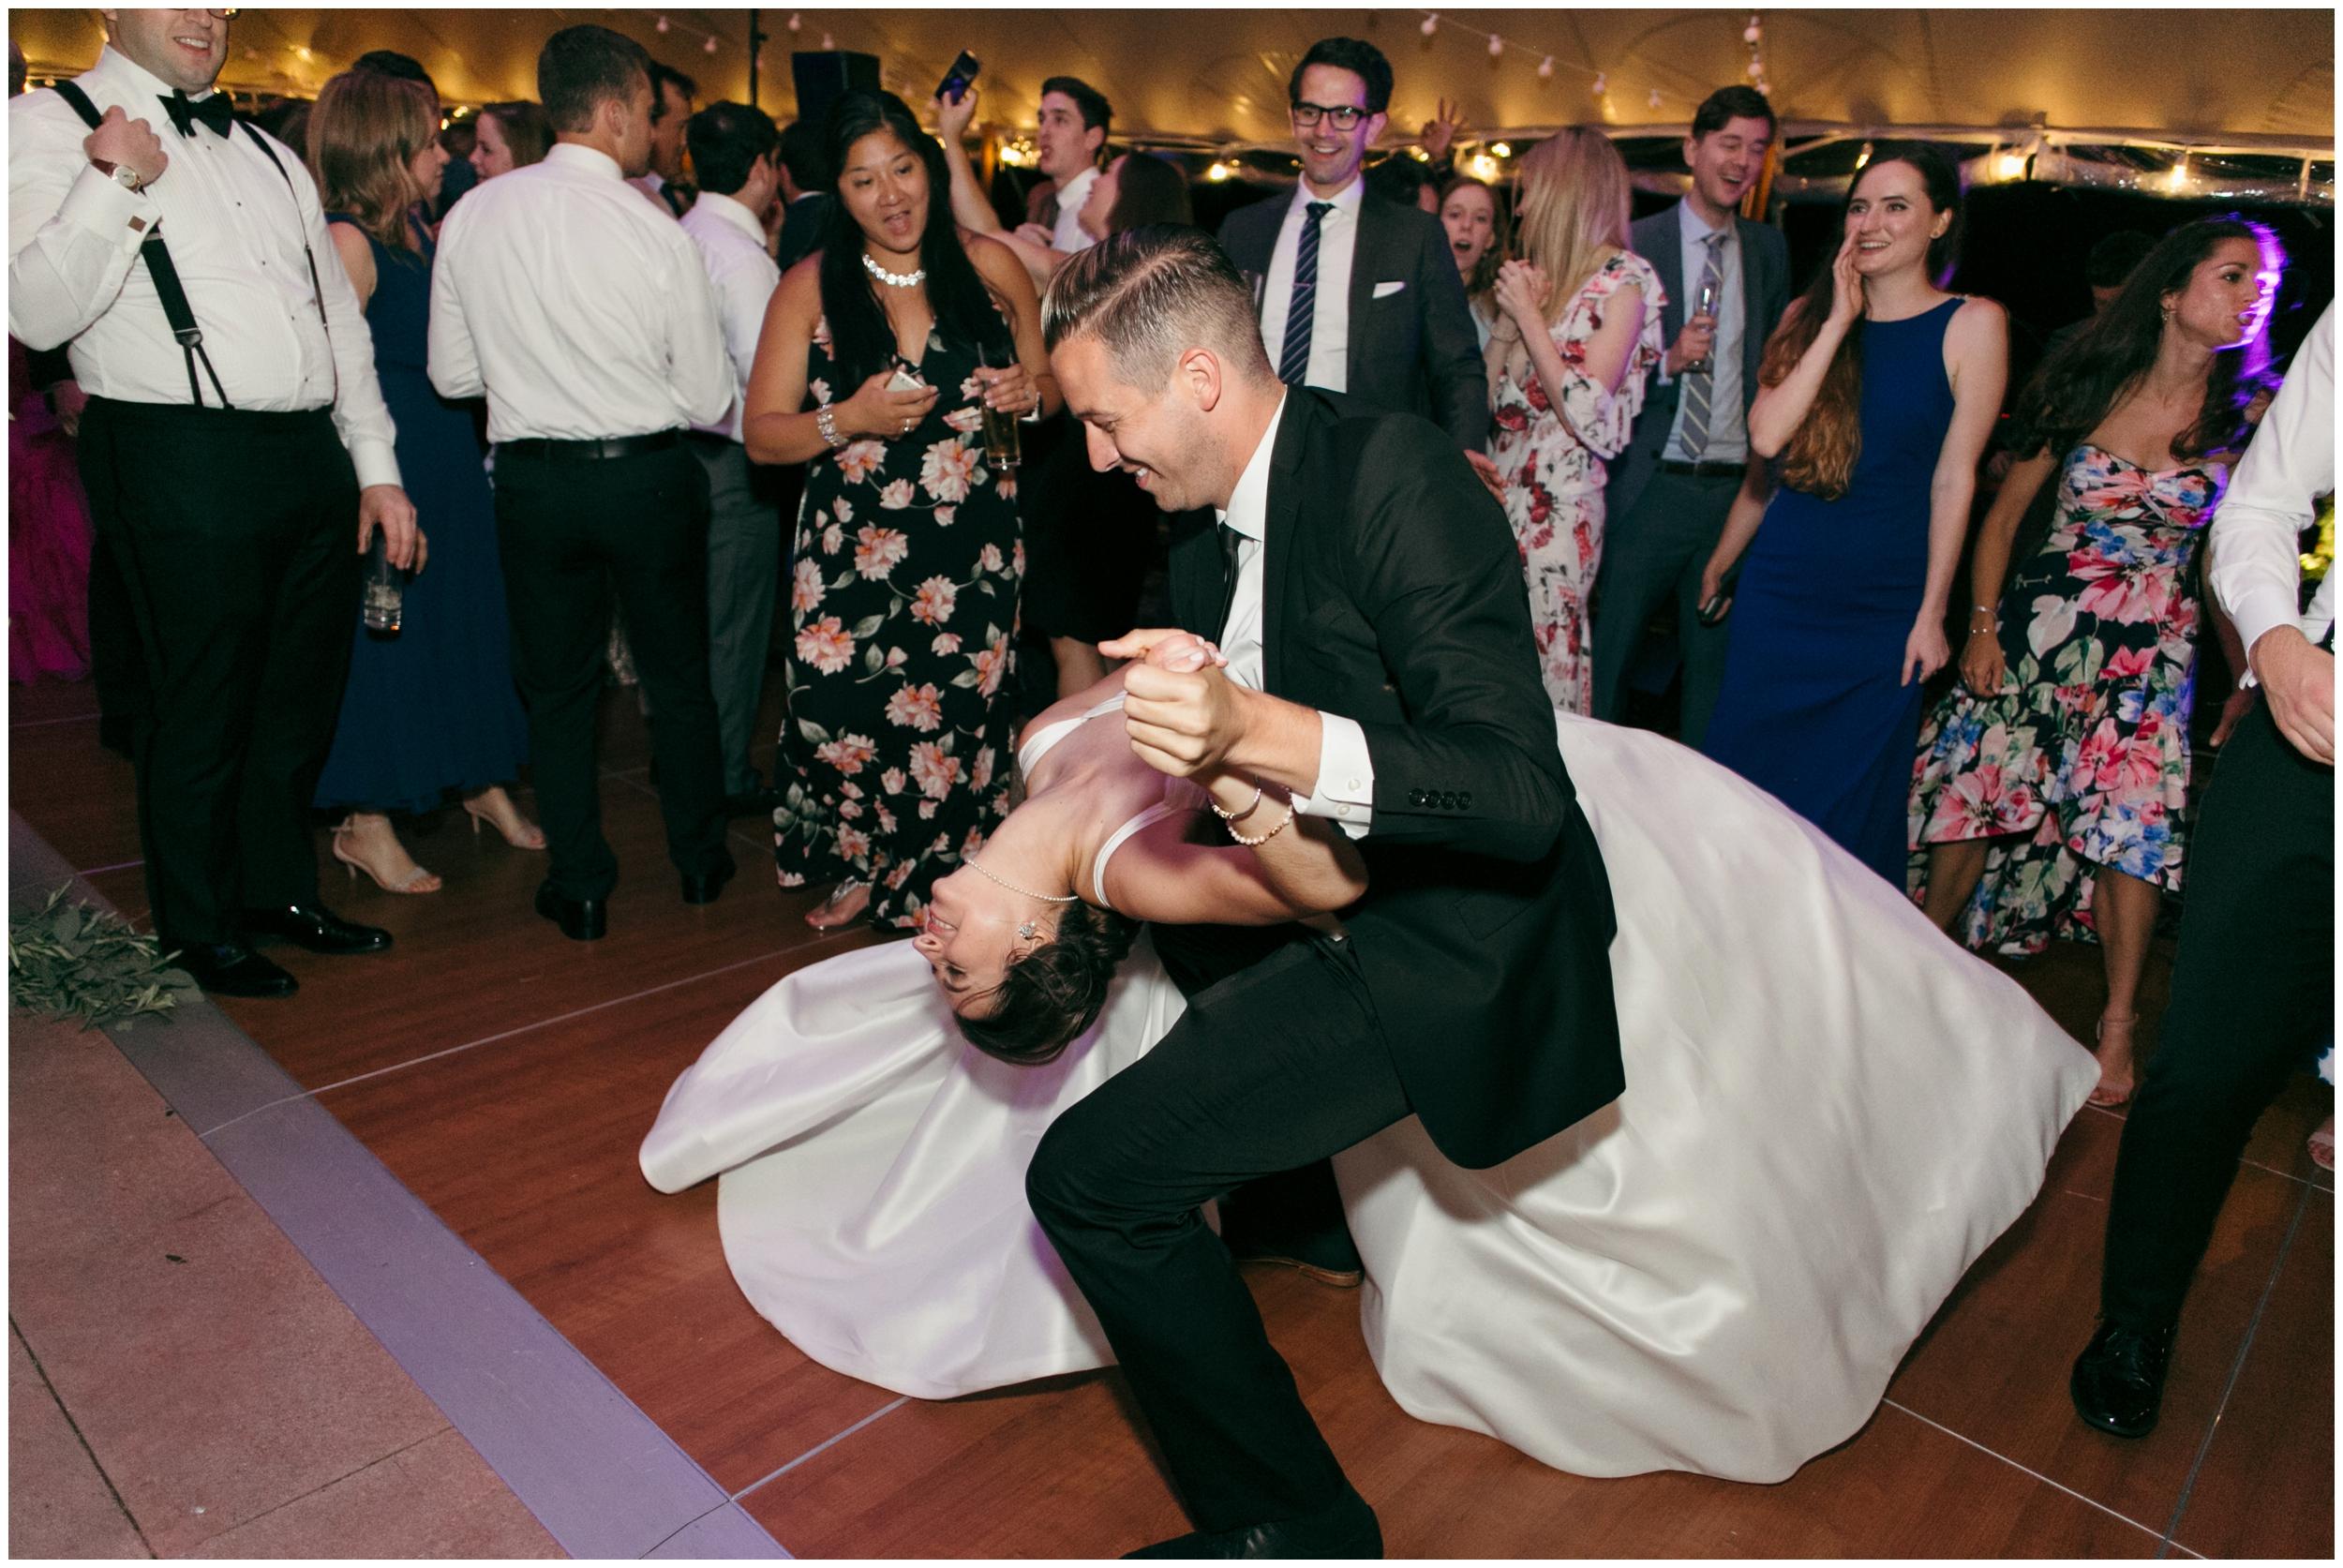 Willowdale-Estate-Wedding-Bailey-Q-Photo-Boston-Wedding-Photographer-113.JPG